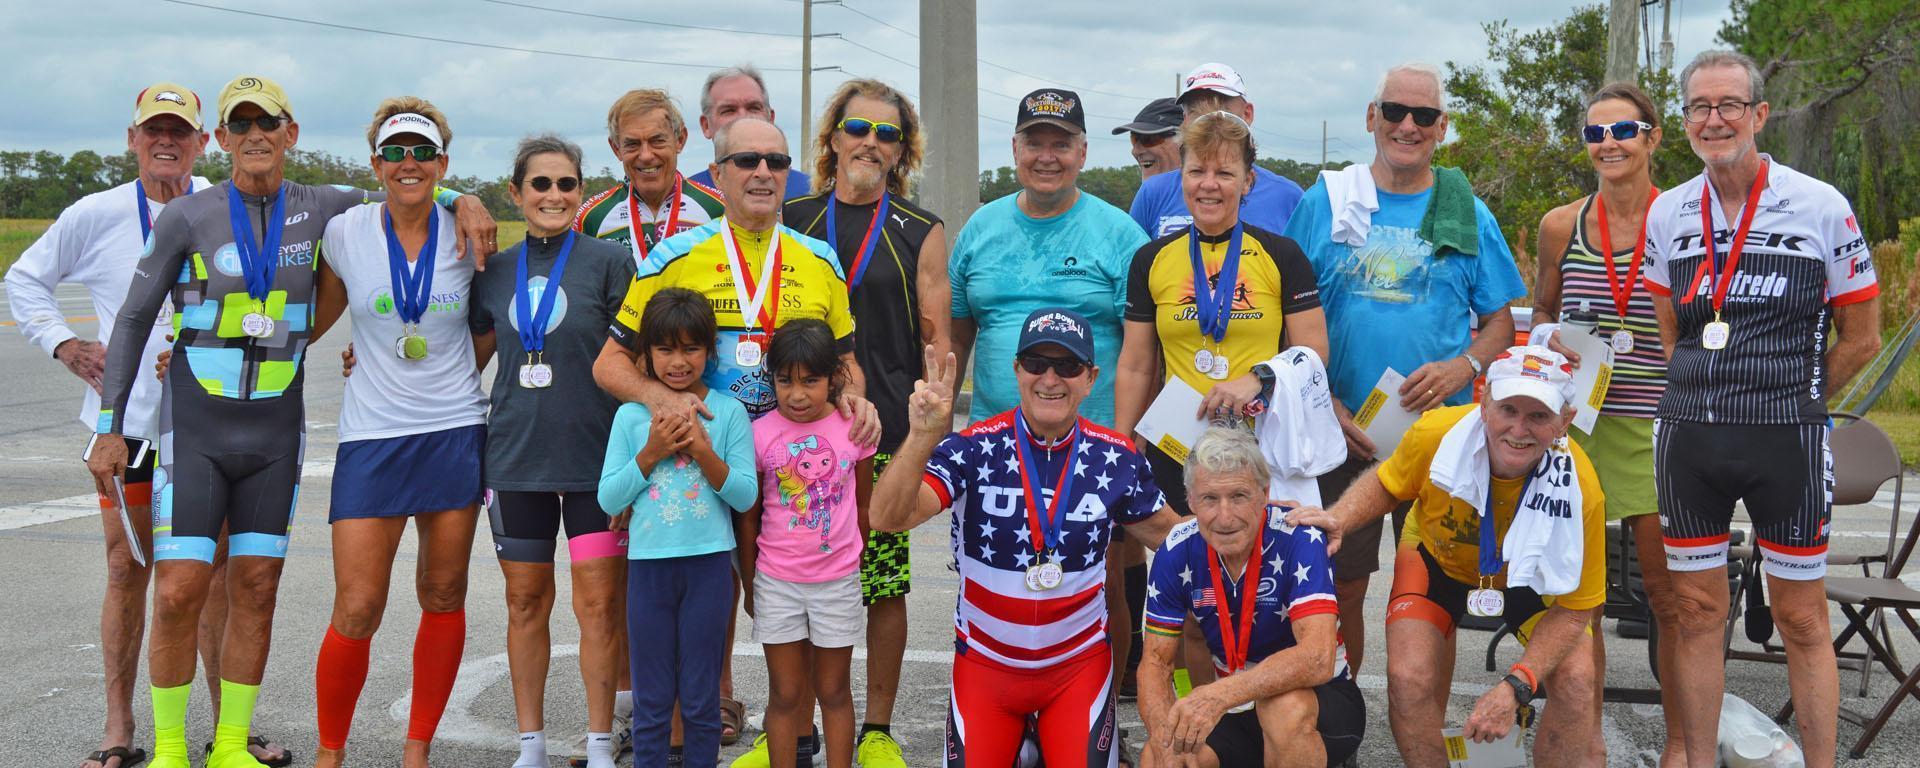 Martin County Senior Games participants in a group photo.